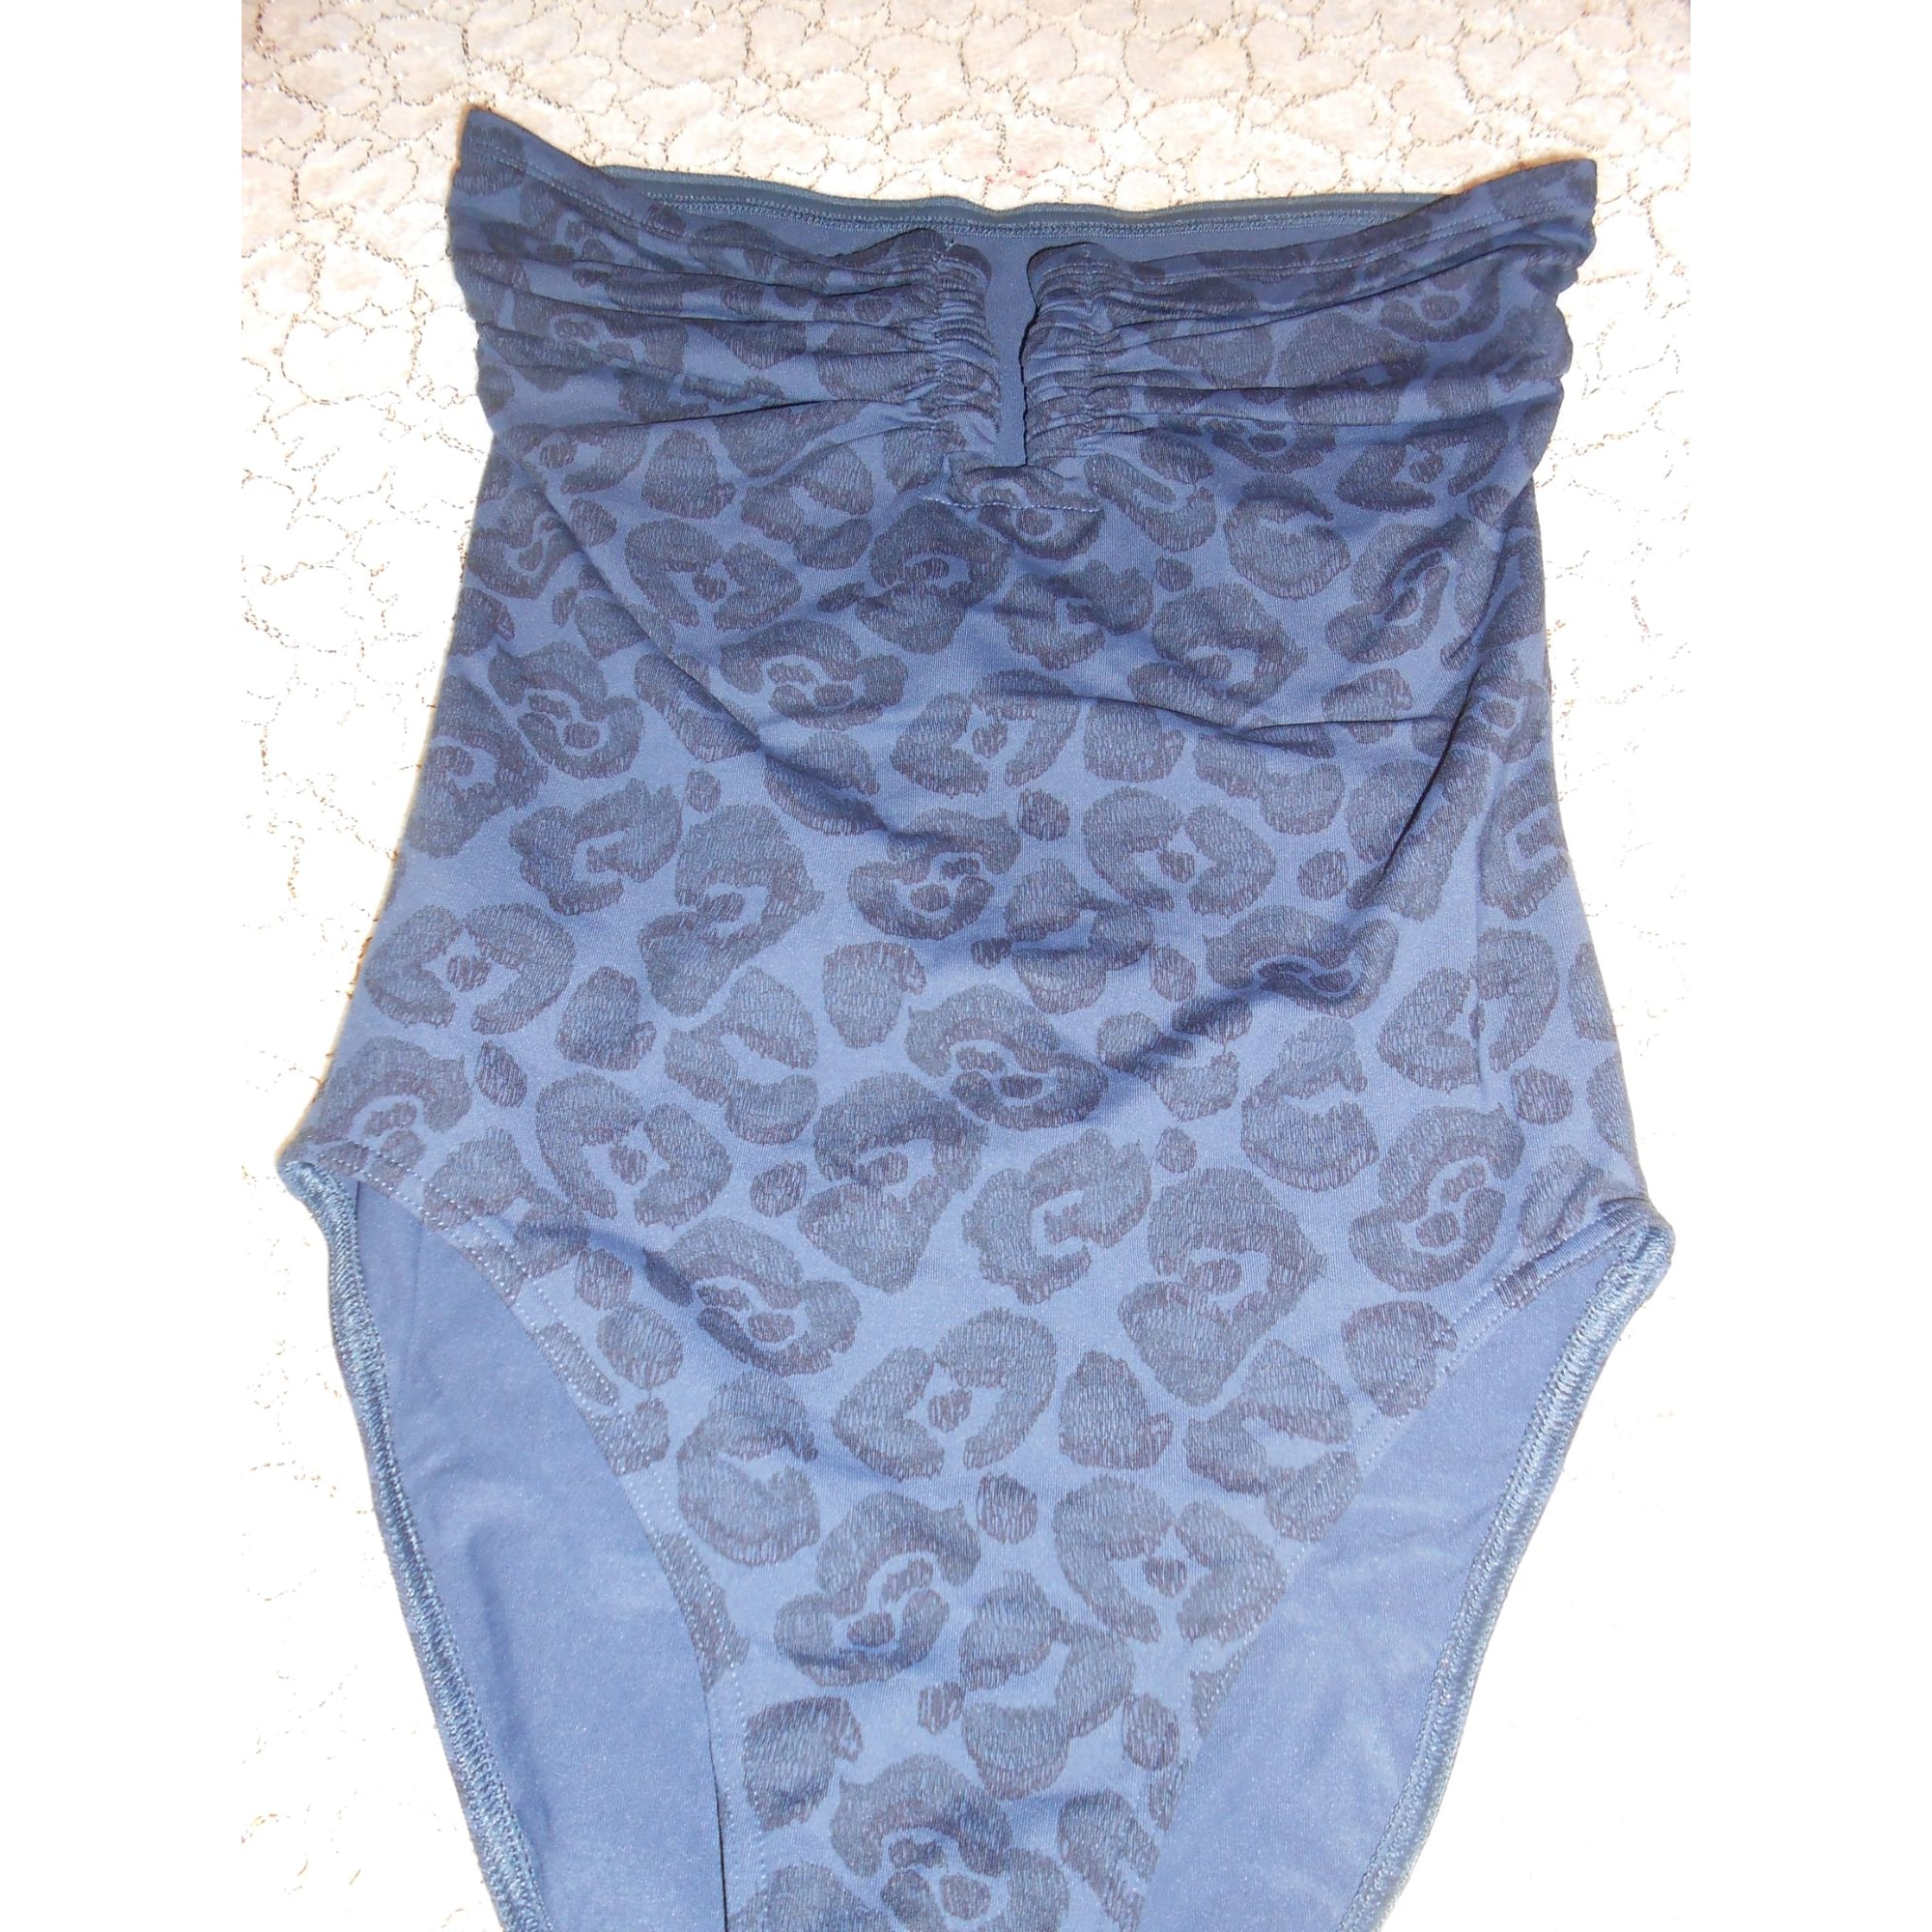 Maillot de bain une-pièce ERES Bleu, bleu marine, bleu turquoise